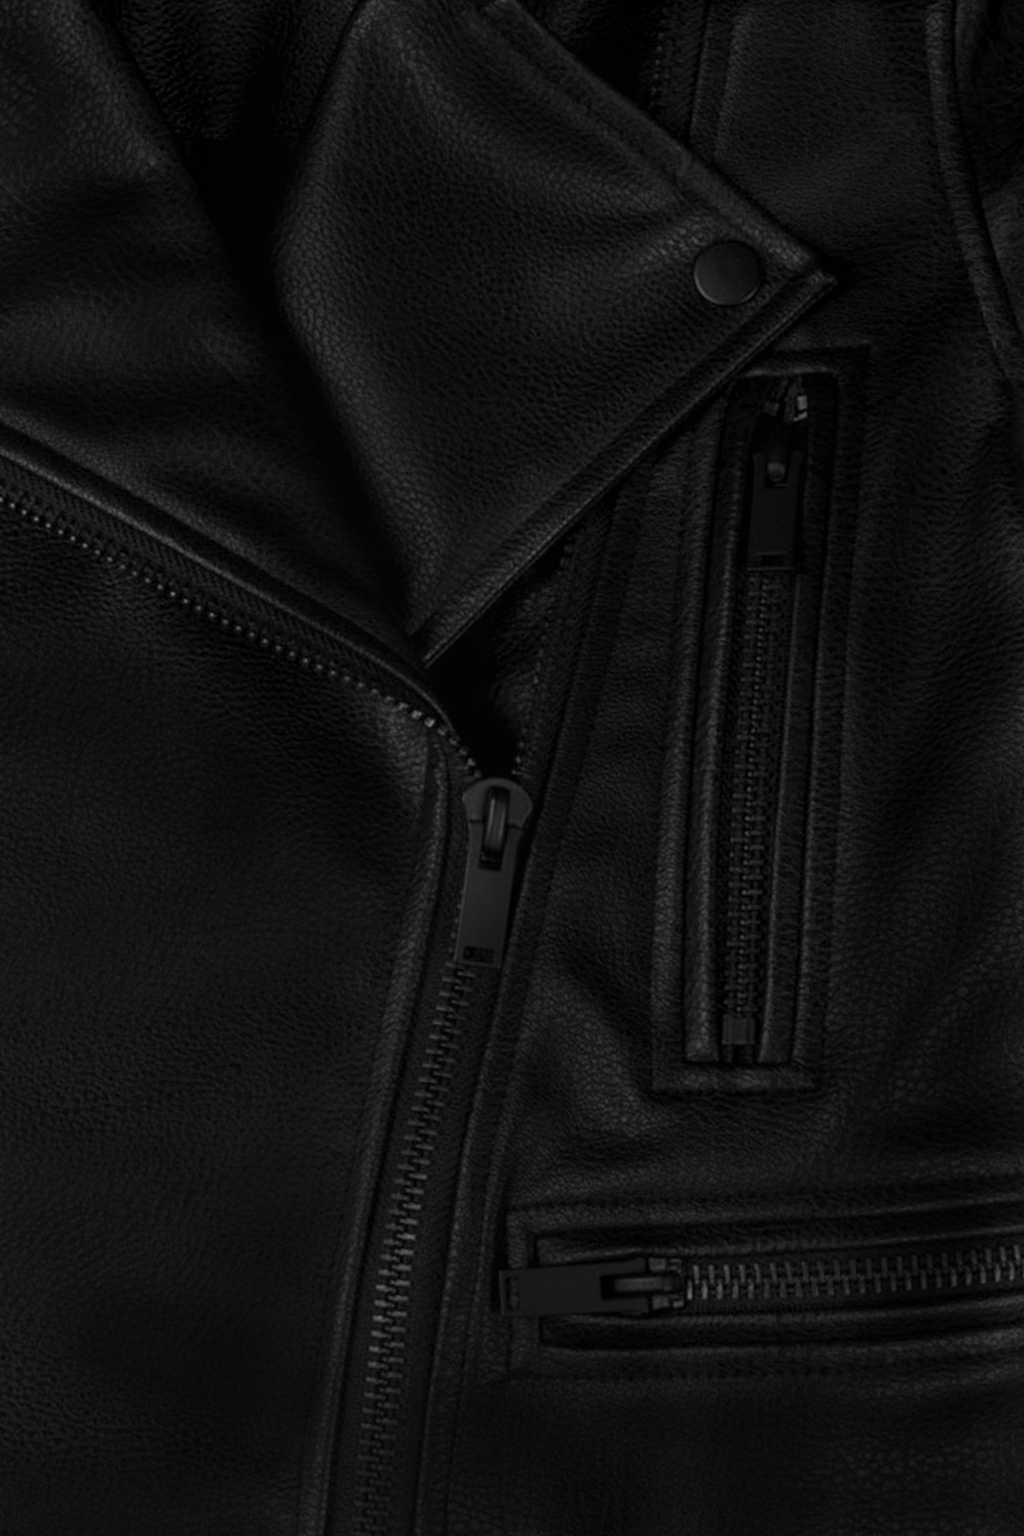 Moto Jacket 1477 Black 8